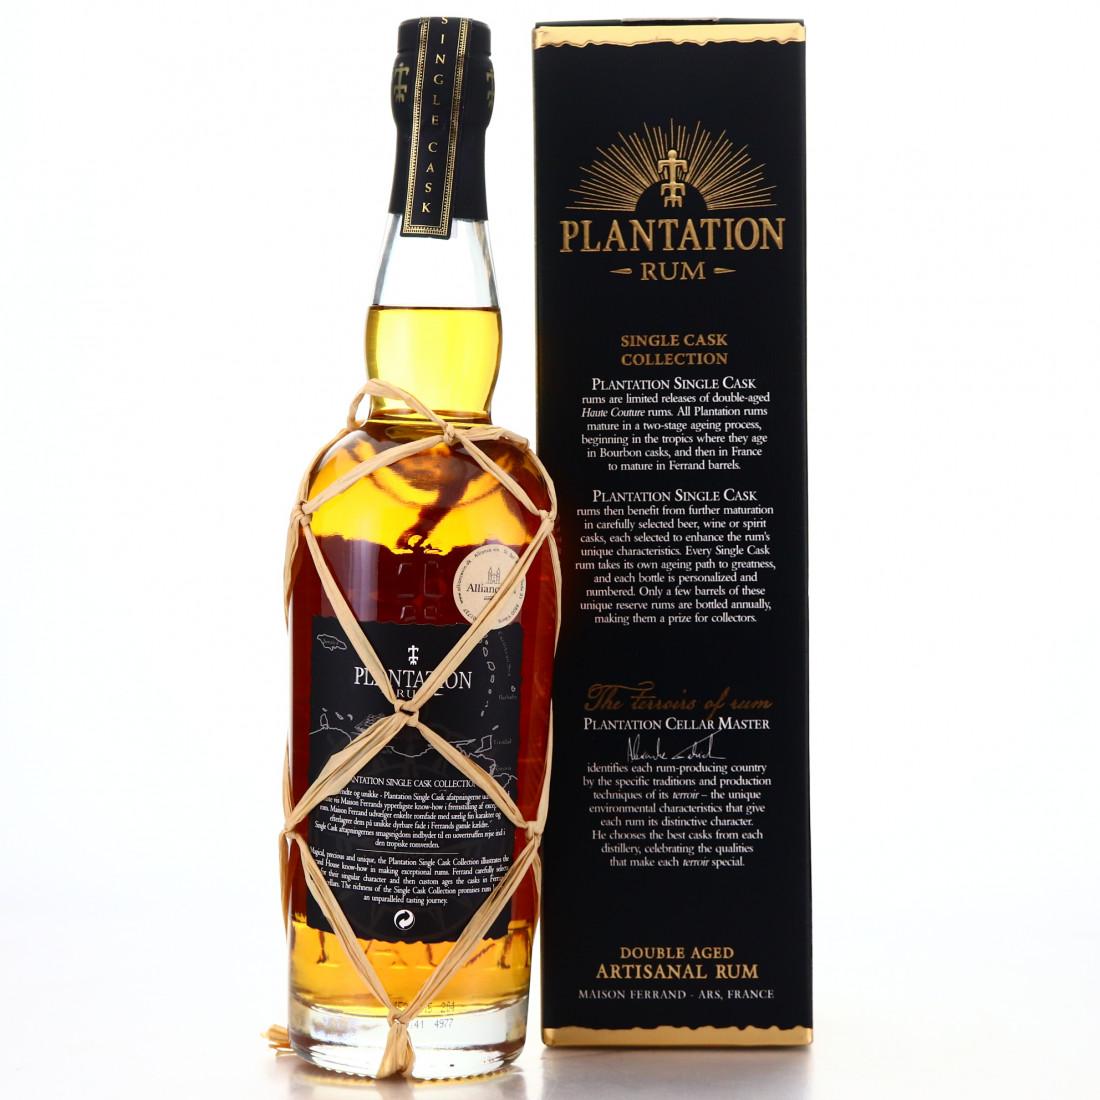 Panama Rum 8 Year Old Plantation Single Cask #7 / Aftappet for Alliance Vin Viborg